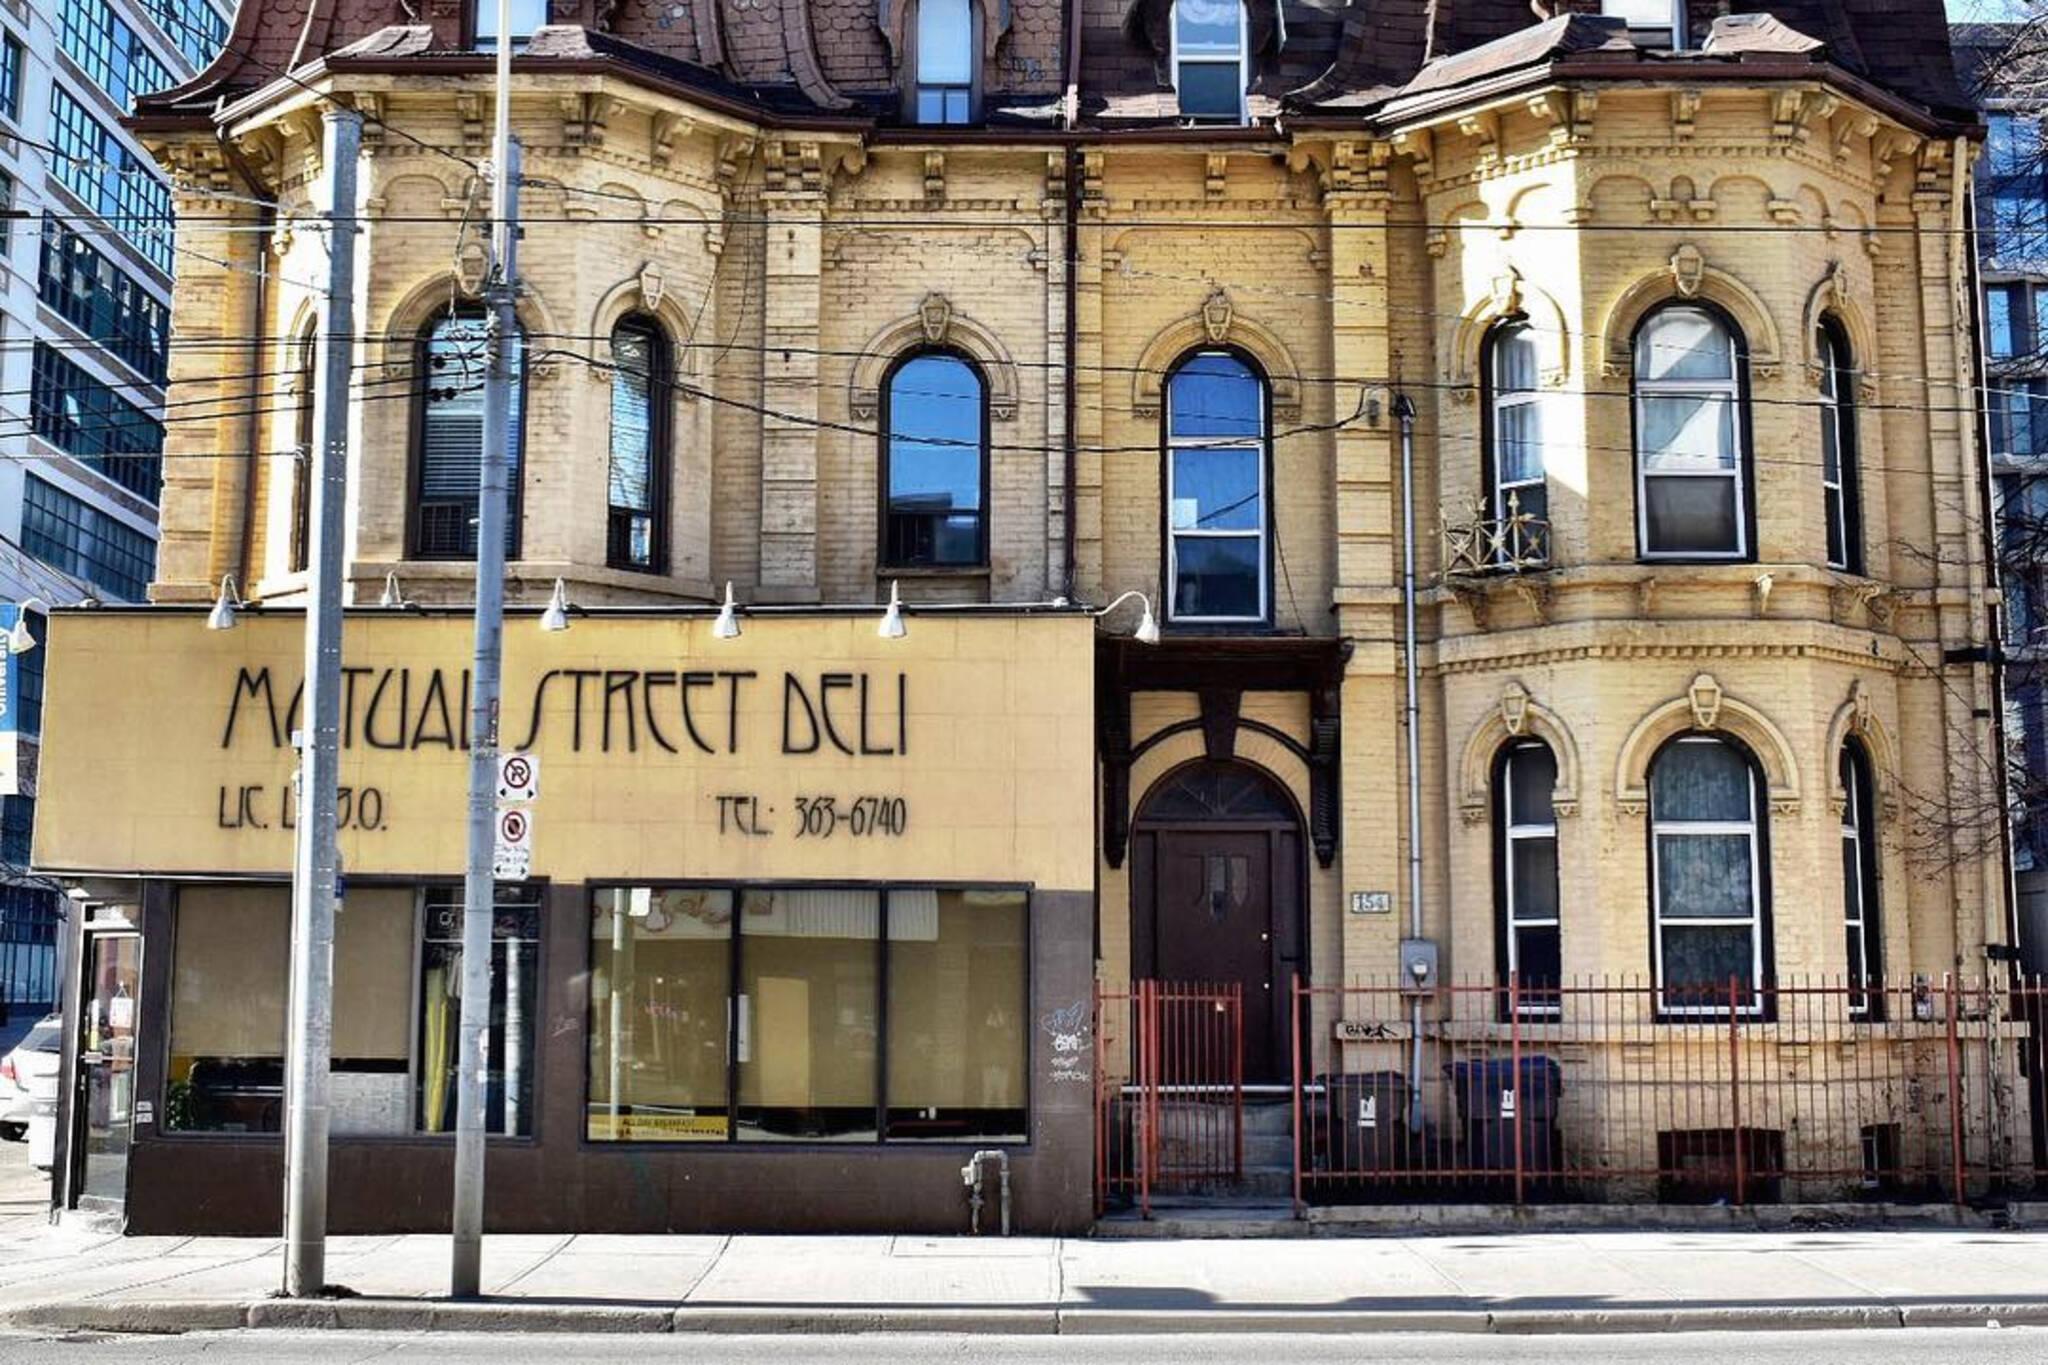 Mutual Street Deli